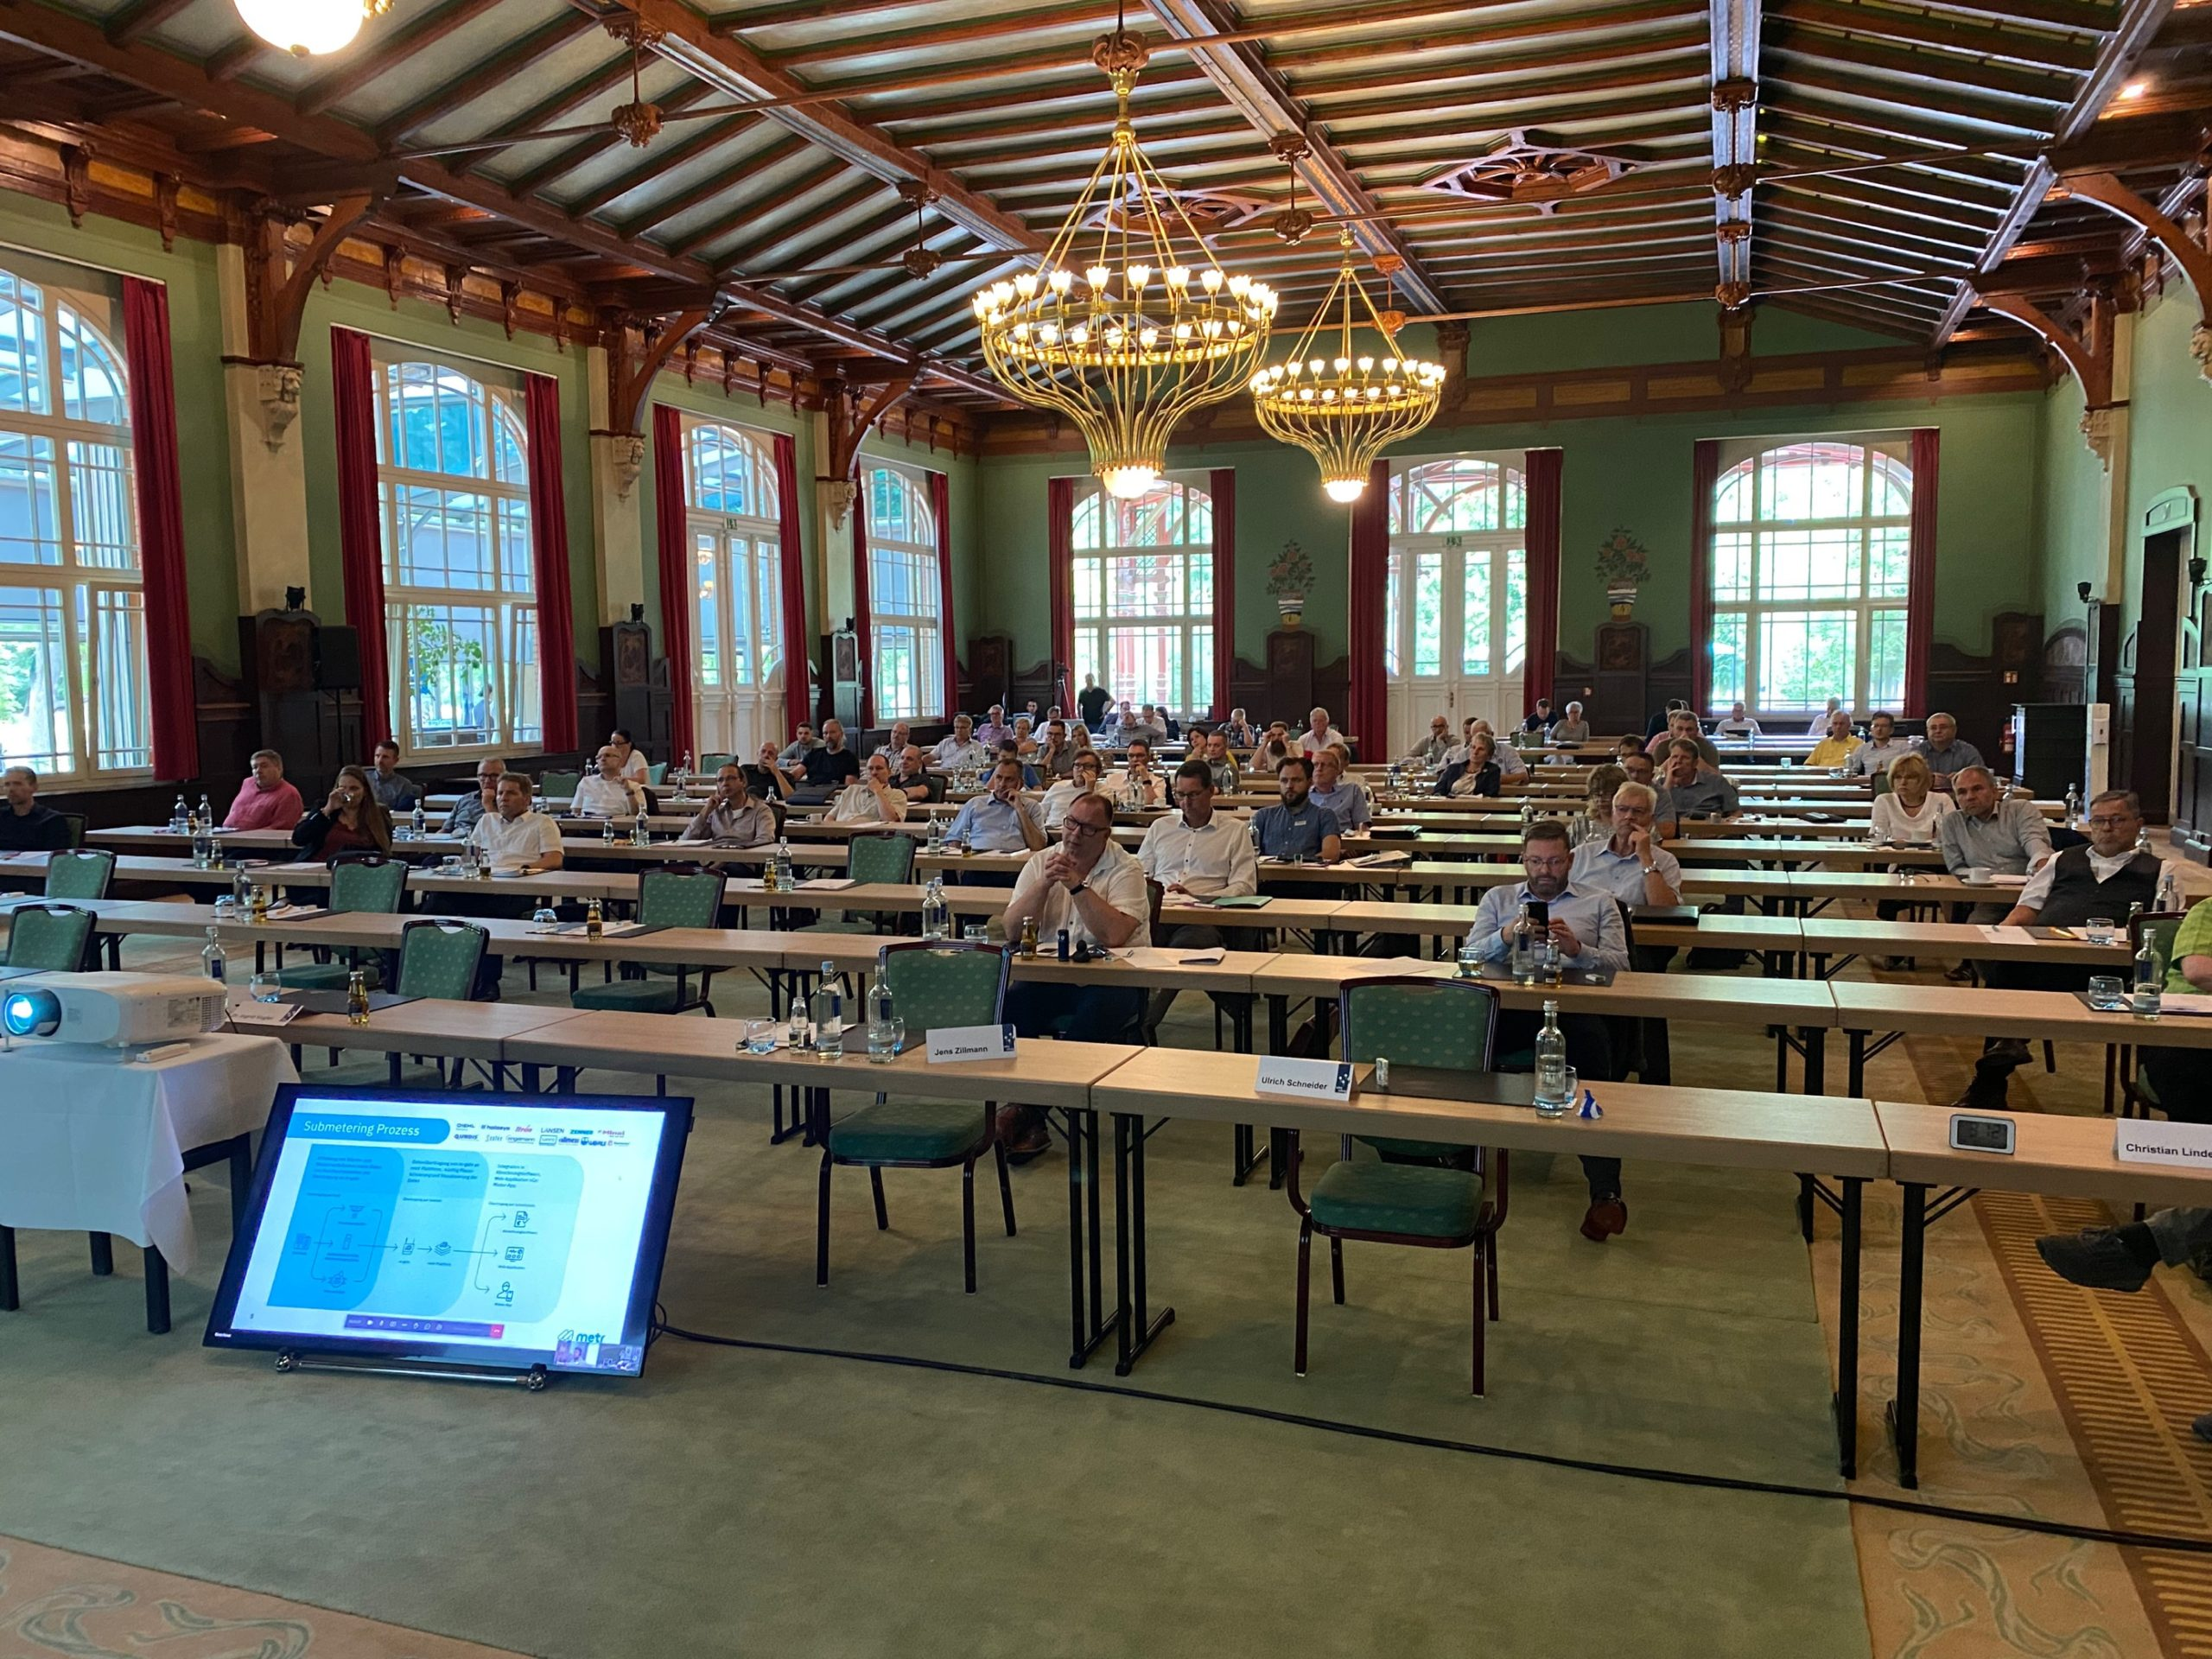 Einblick in die Veranstaltung im Dorint Herrenkrug Parkhotel Magdeburg